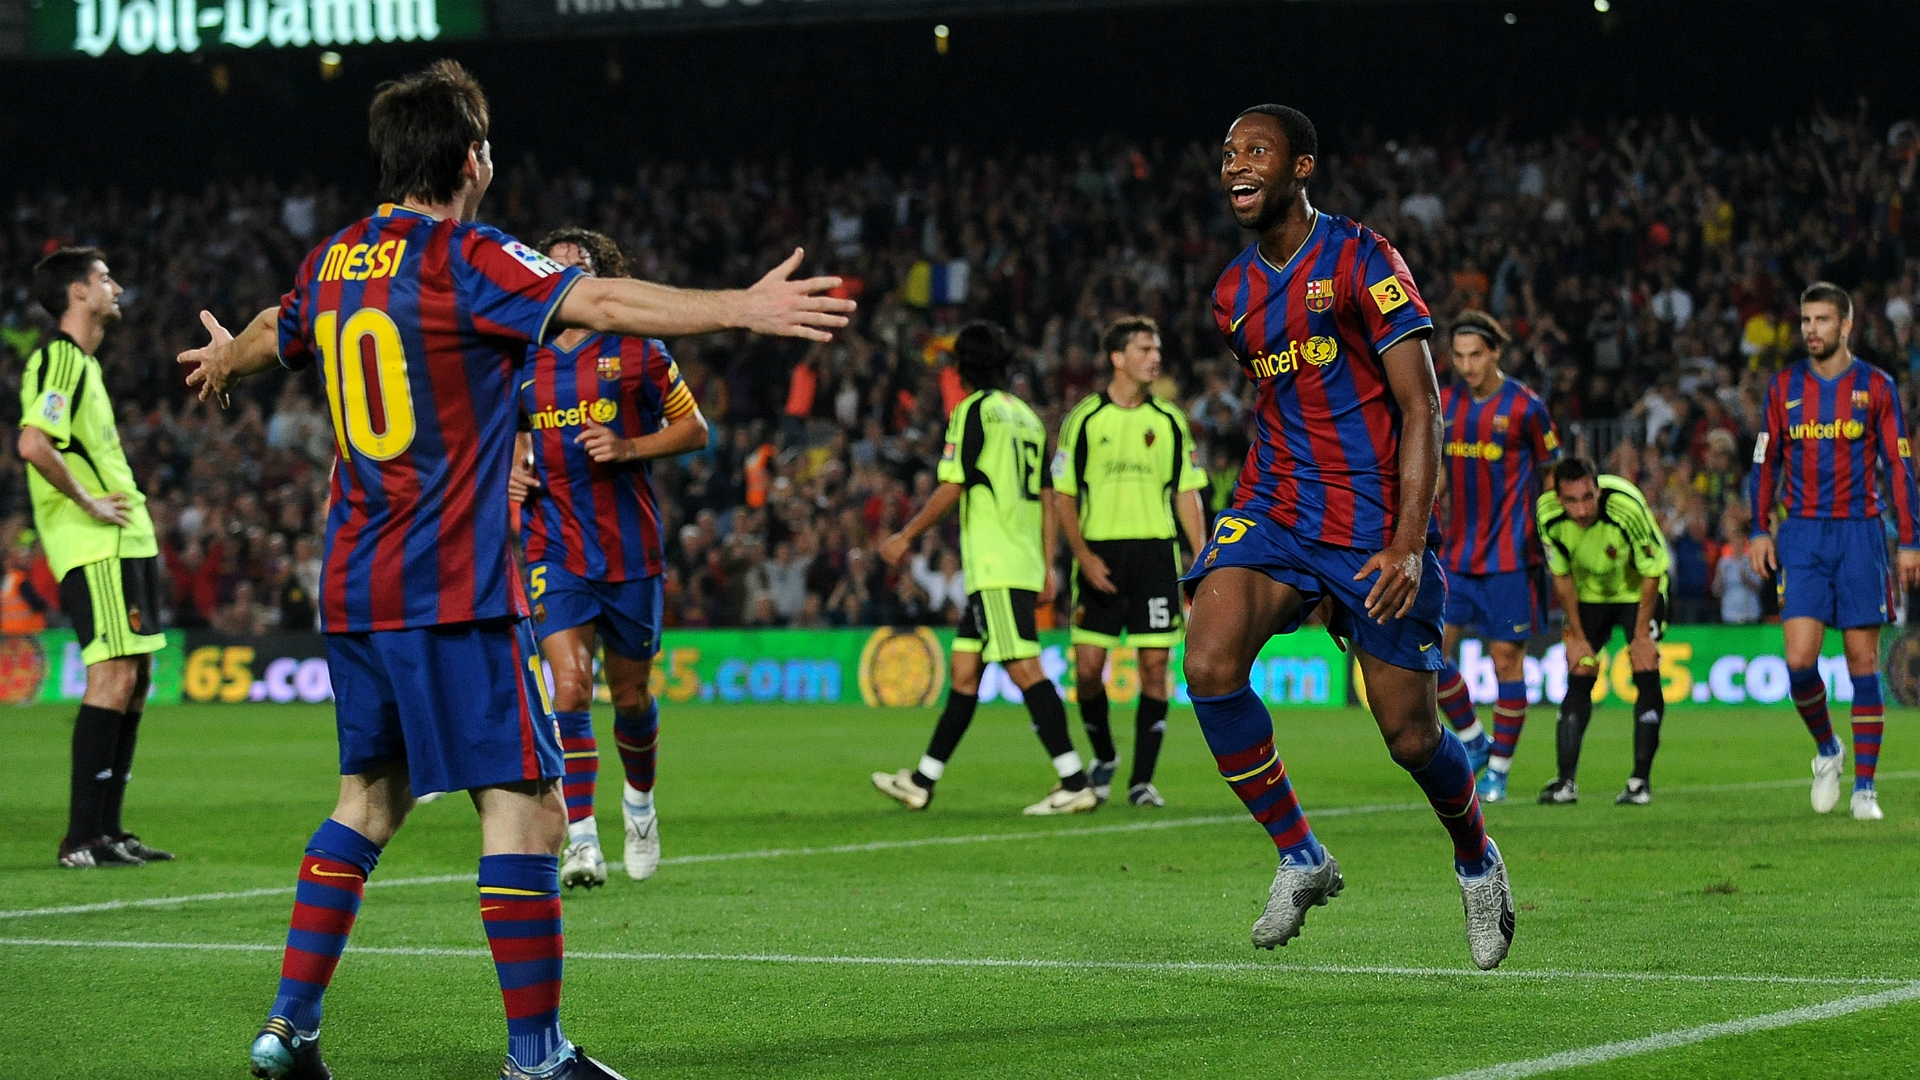 Seydou Keita Lionel Messi Barcelona Zaragoza 10252009